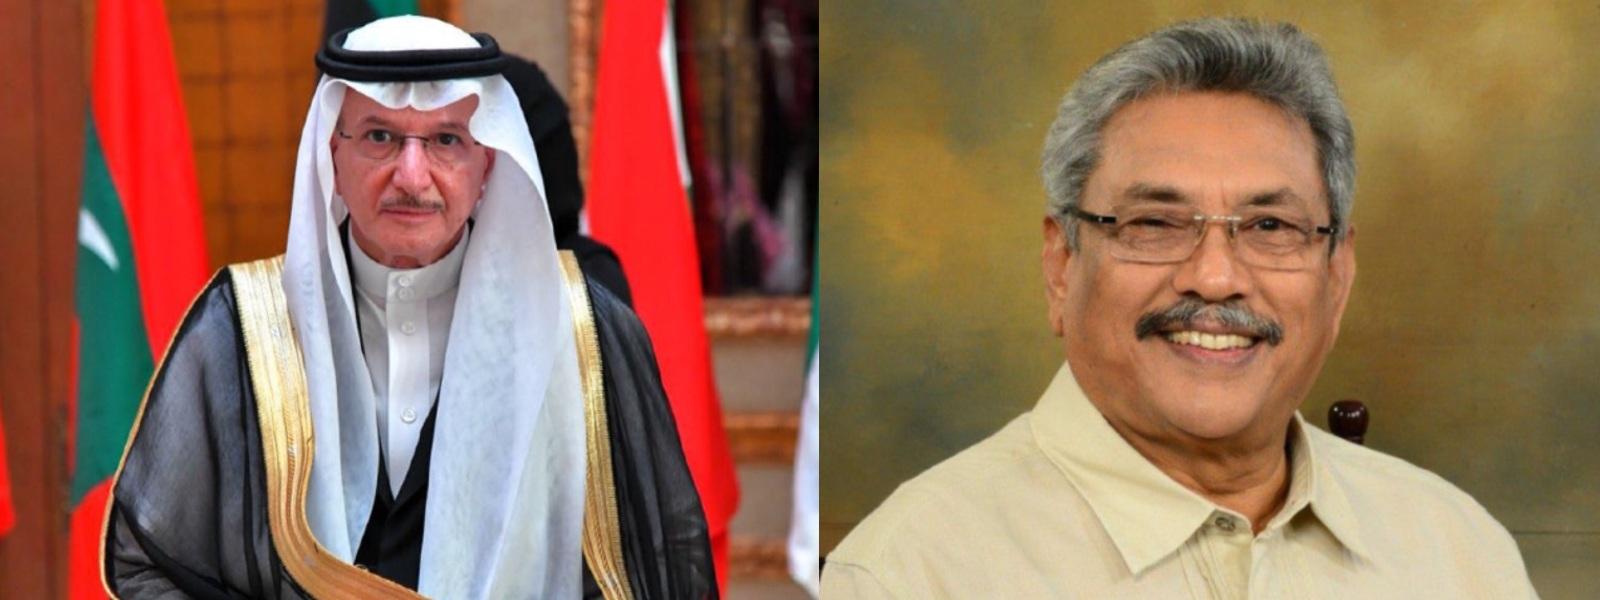 President speaks to Organization of Islamic Cooperation's Sec. Gen.